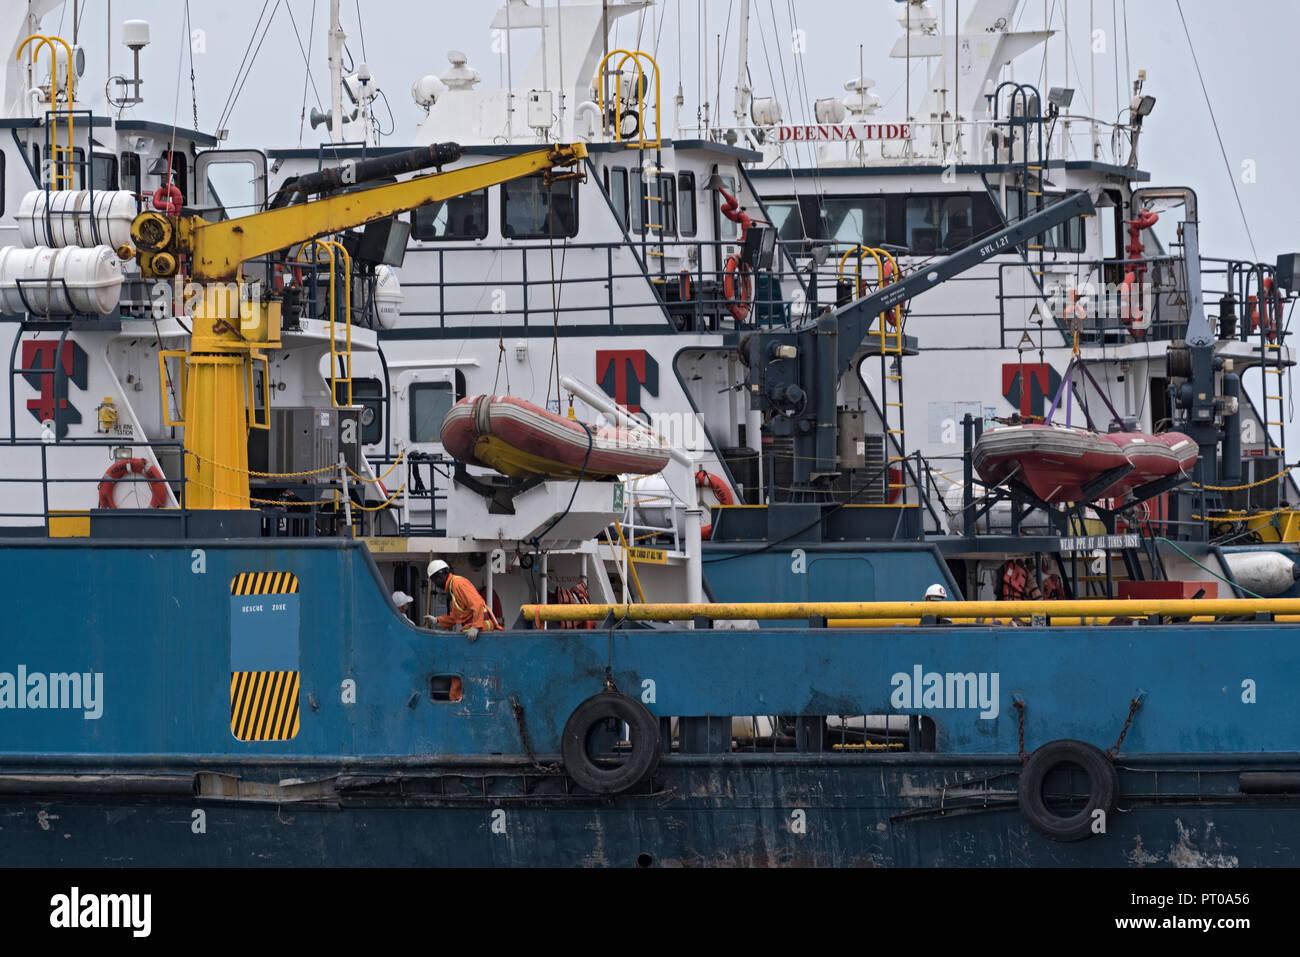 vessels in the atlantic harbor of walvis bay, namibia. - Stock Image